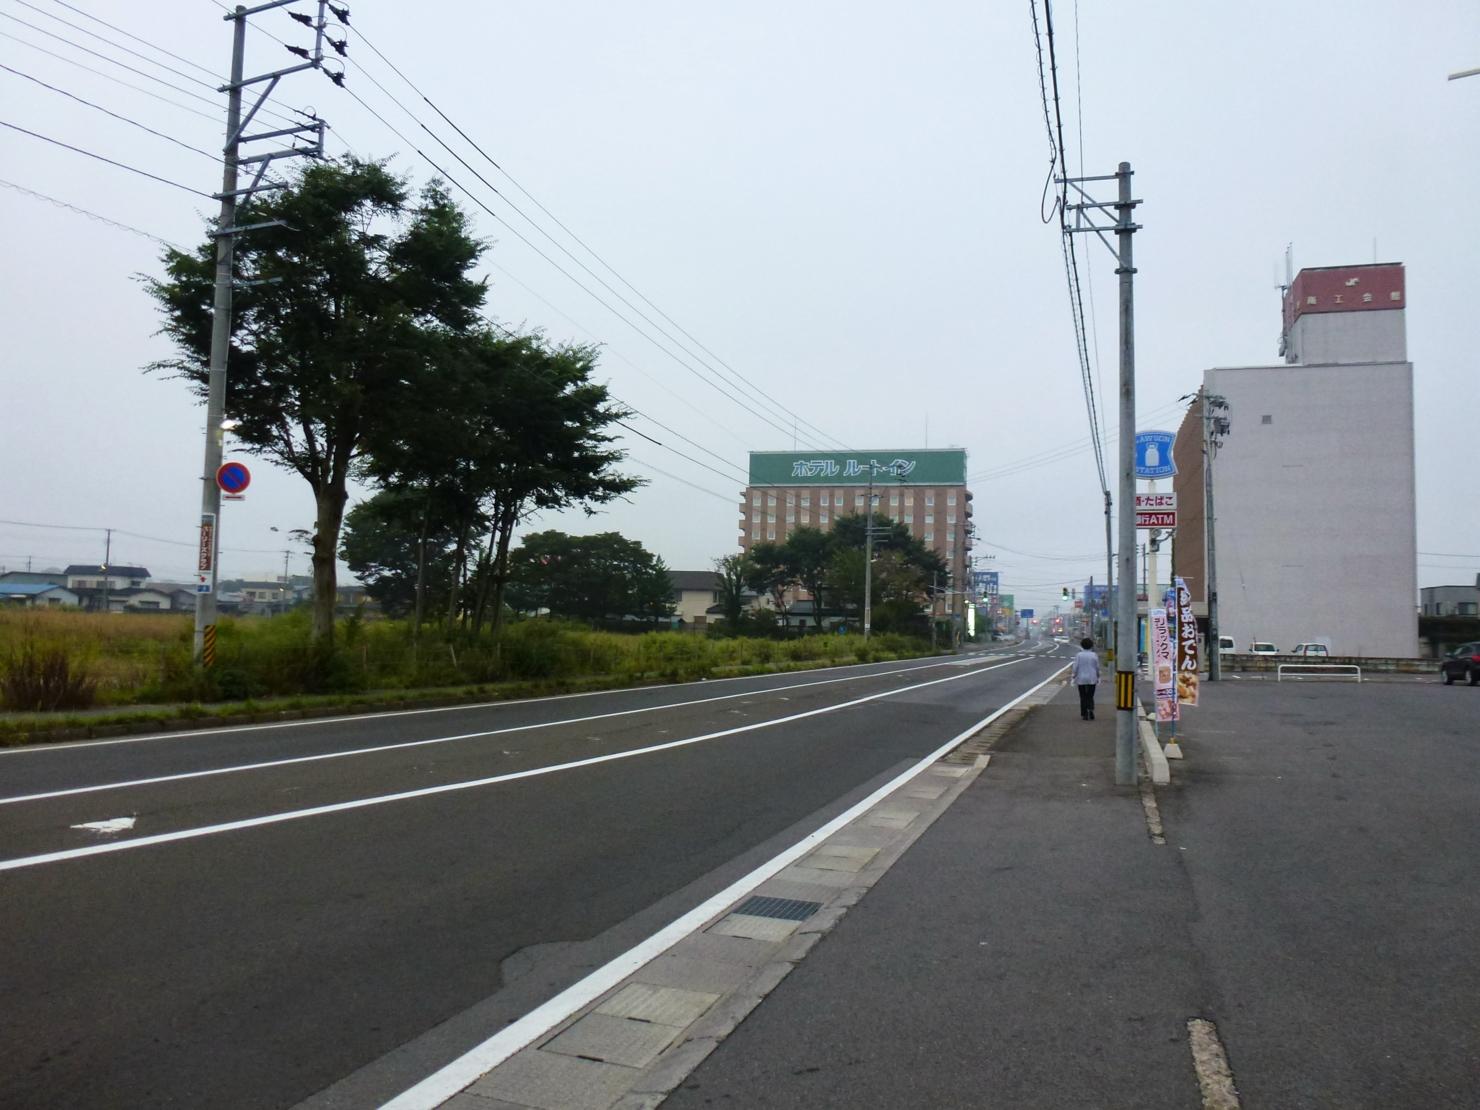 f:id:ToshUeno:20130915053545j:plain